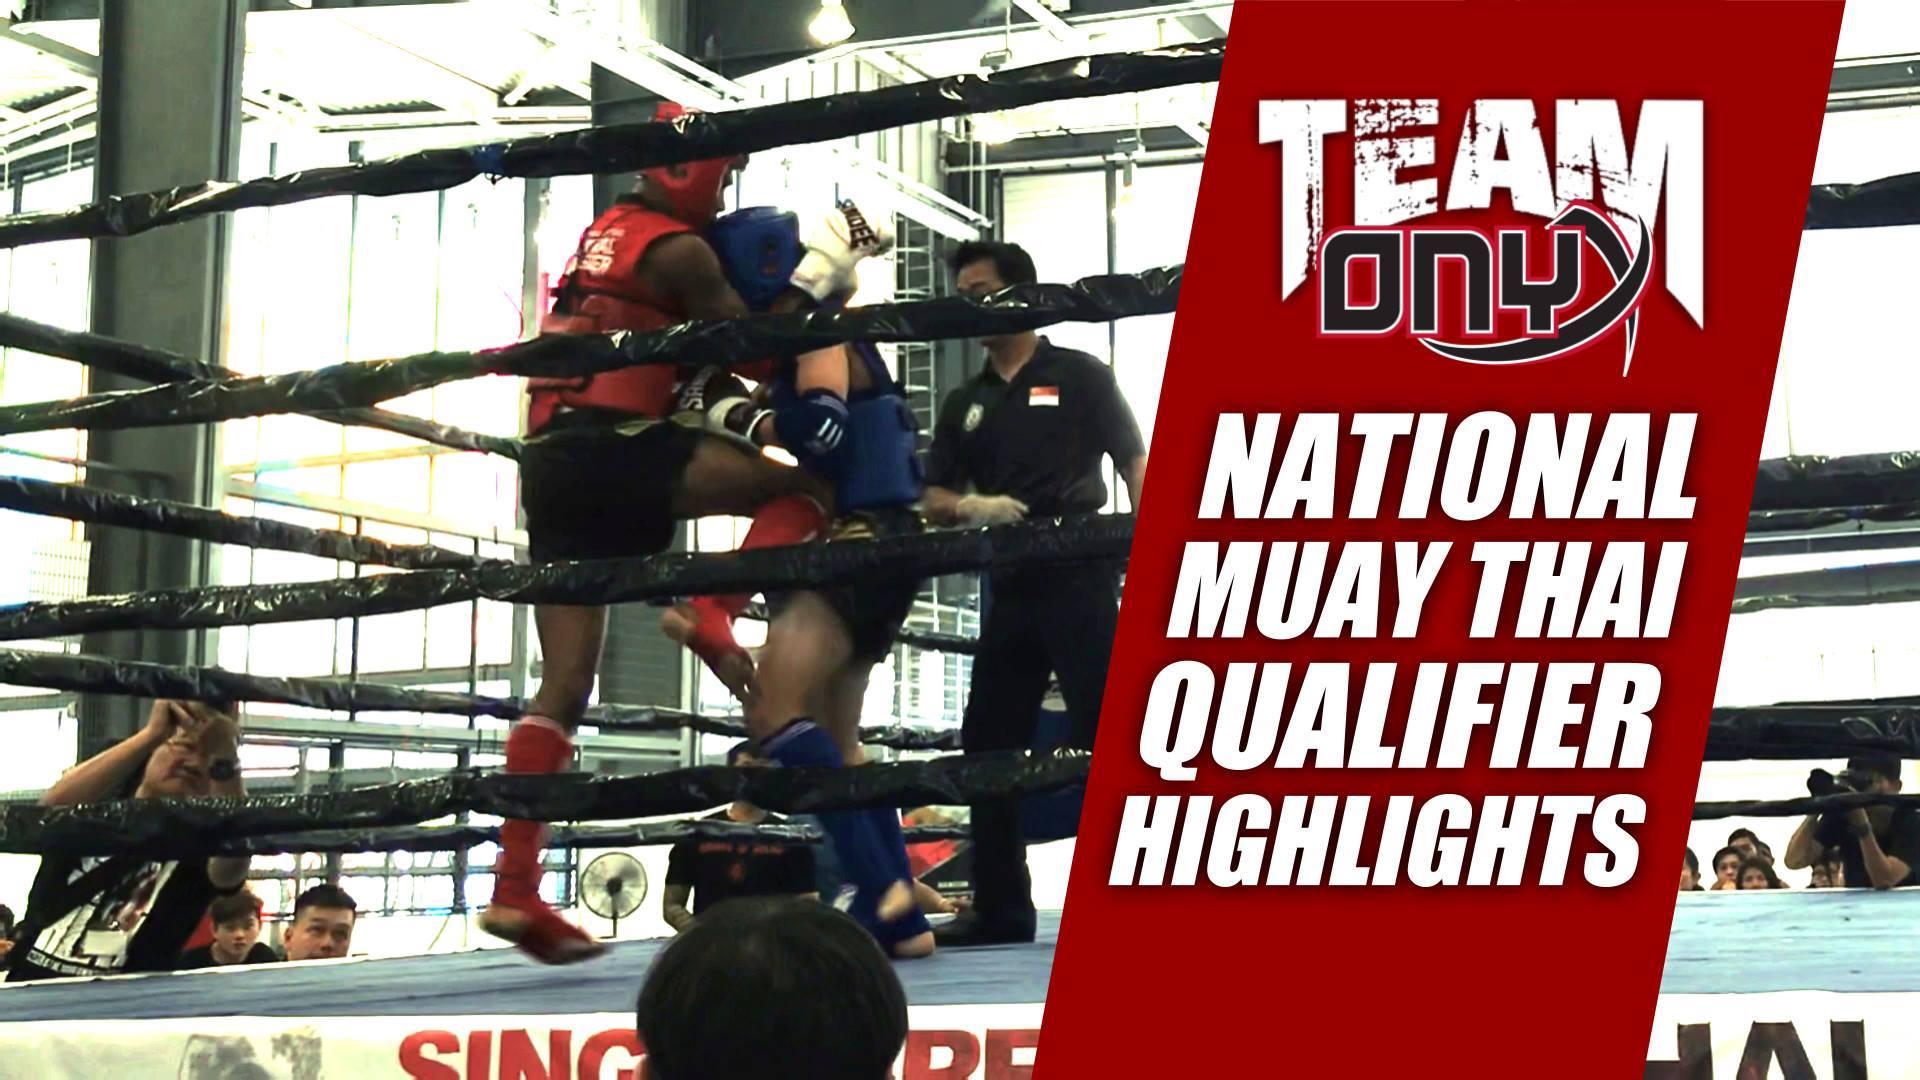 National Muay Thai Qualifier 2019 #1 - Onyx Highlights